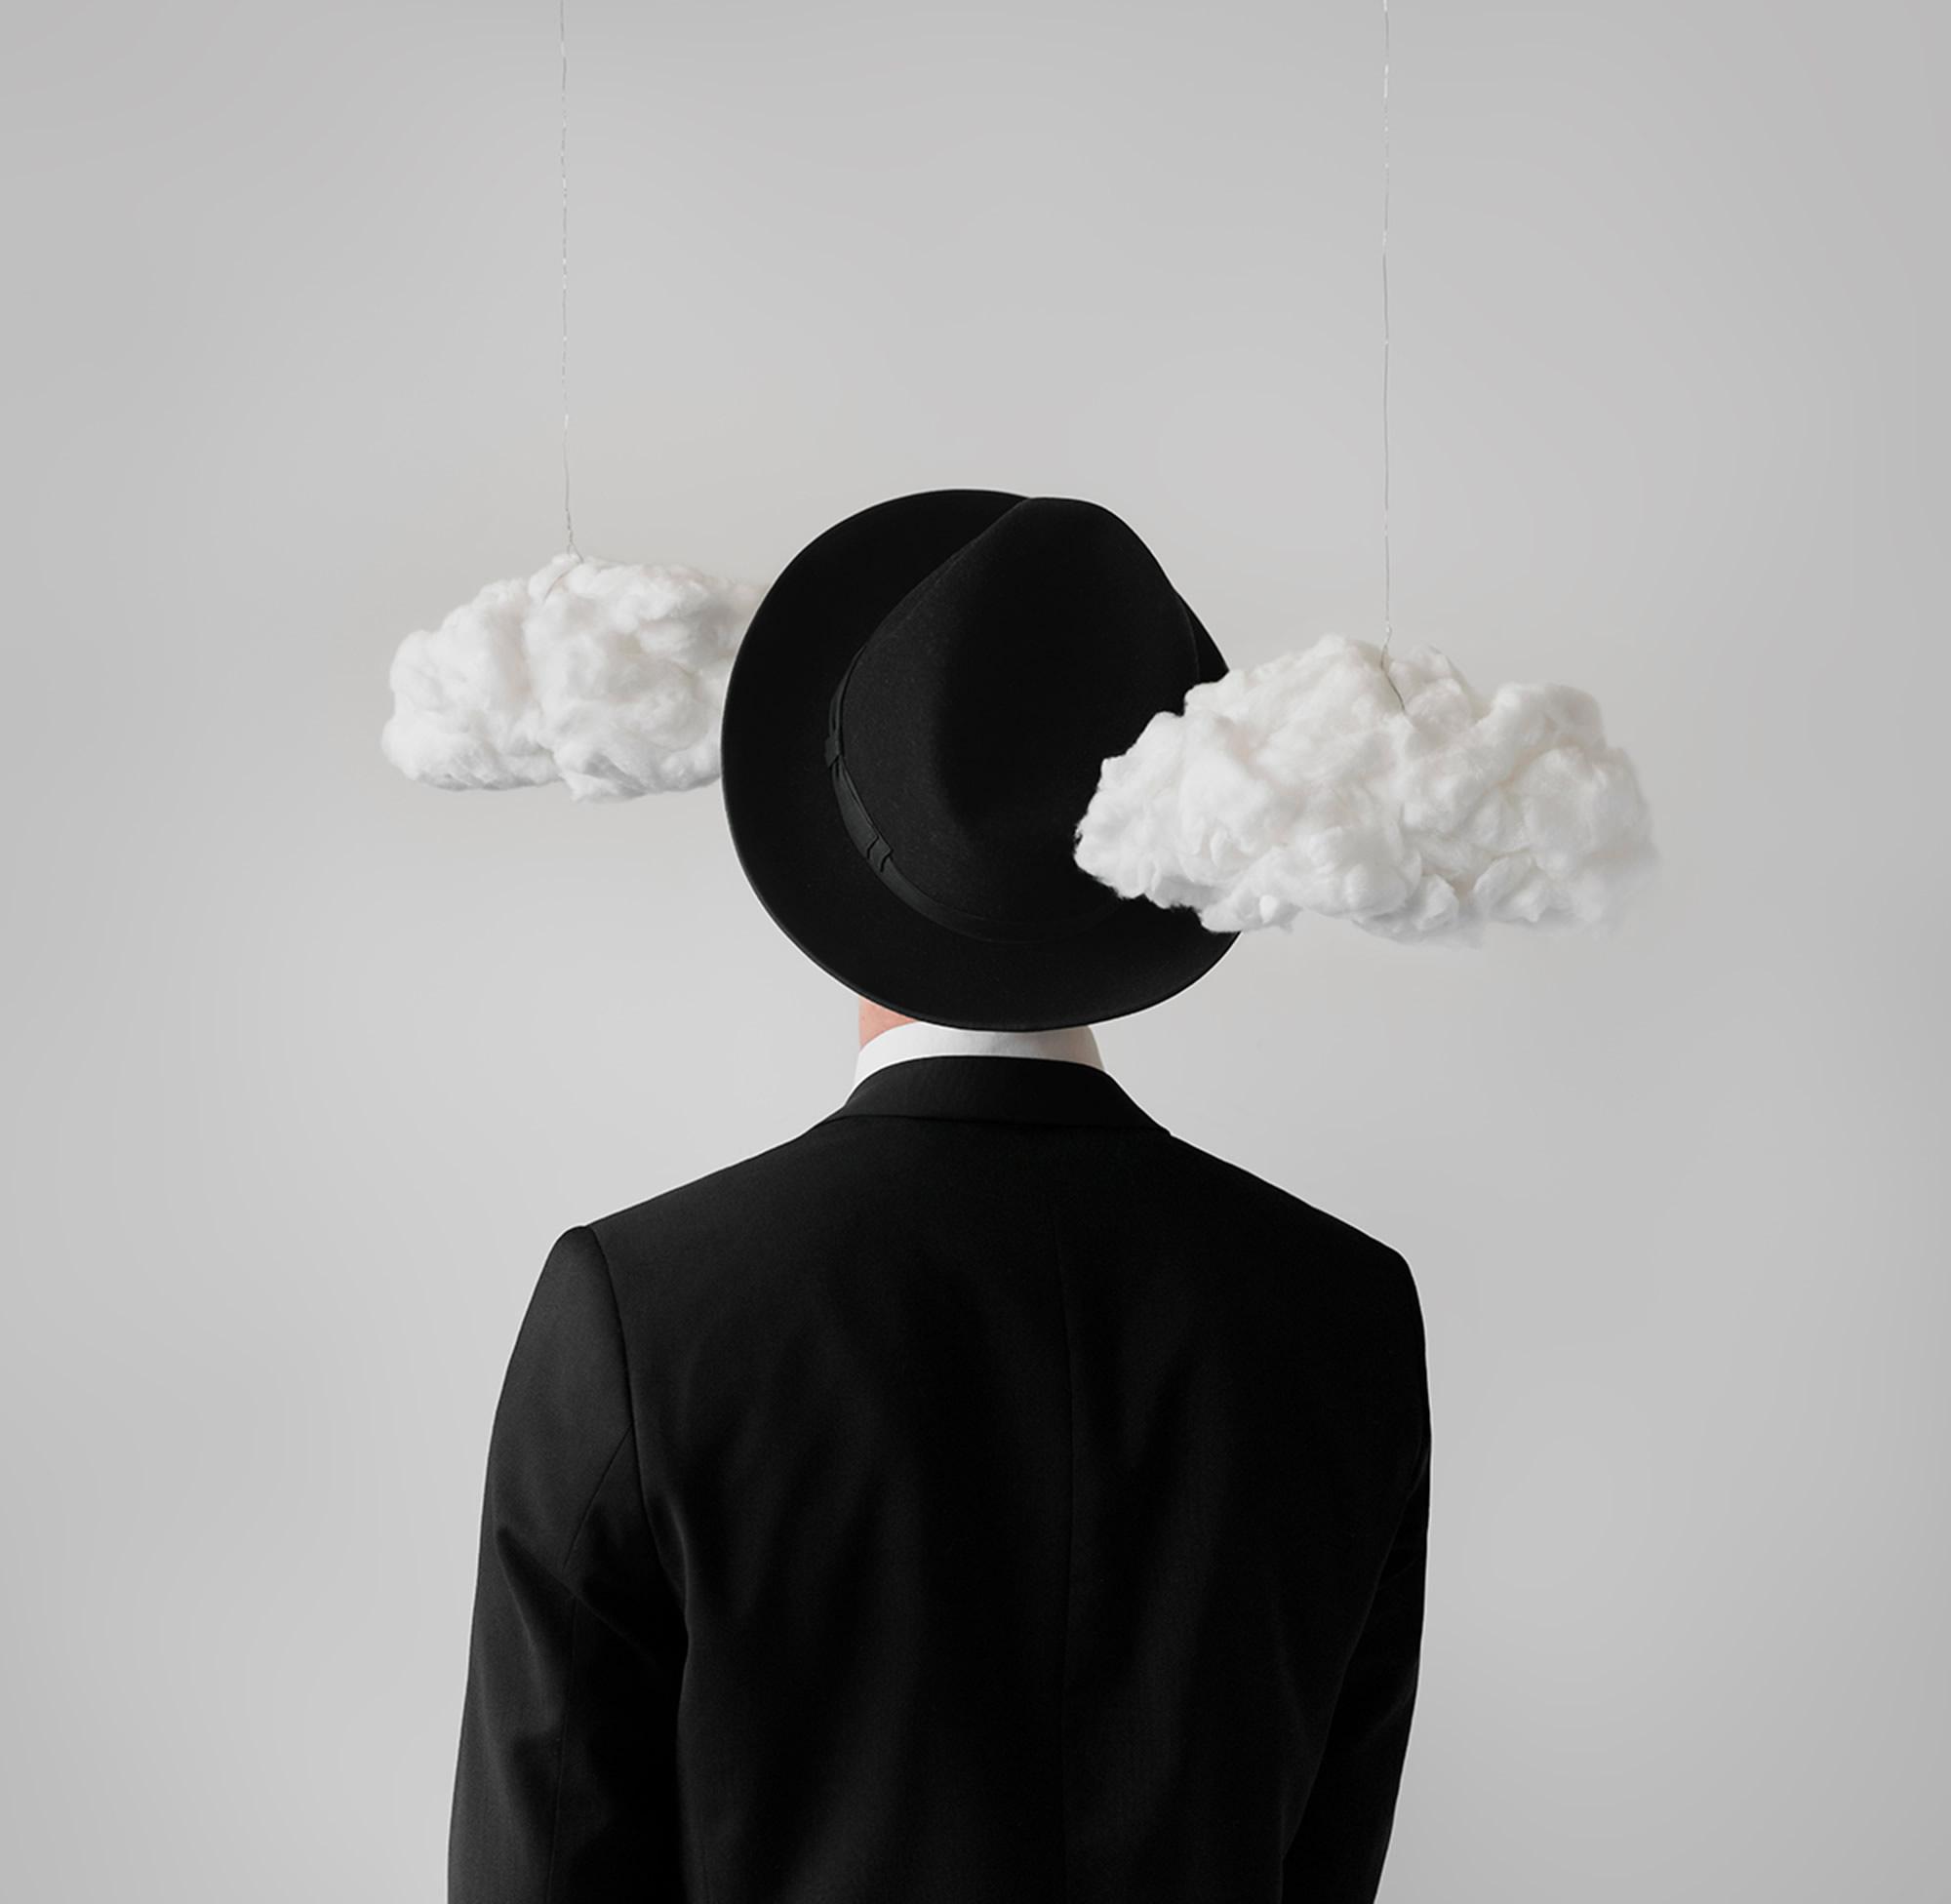 fotografi-ispirazione-rene-magritte-fotografia-arte-16